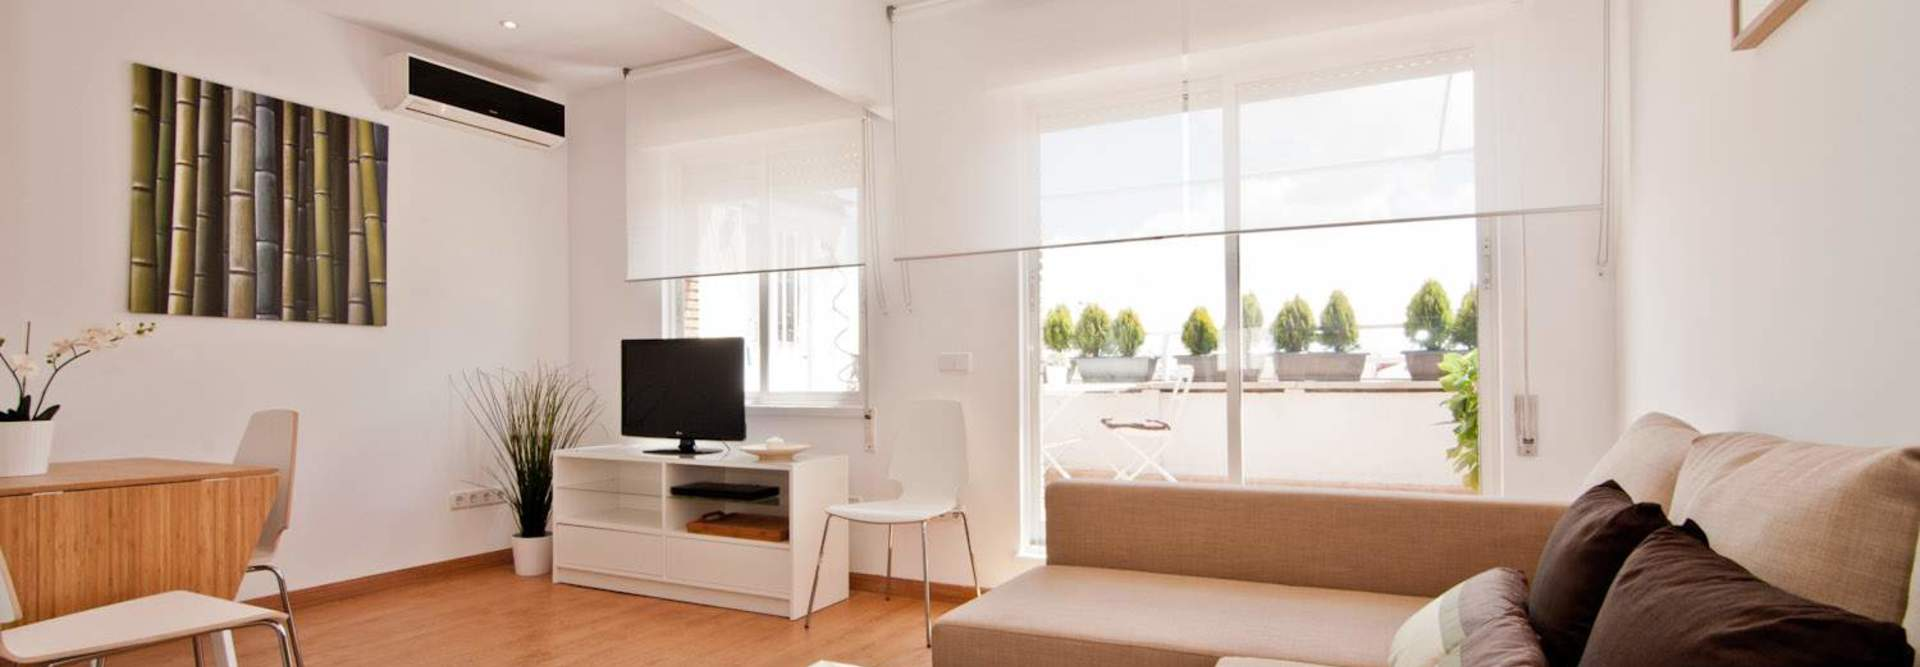 alquiler de apartamentos en madrid zona chamberi